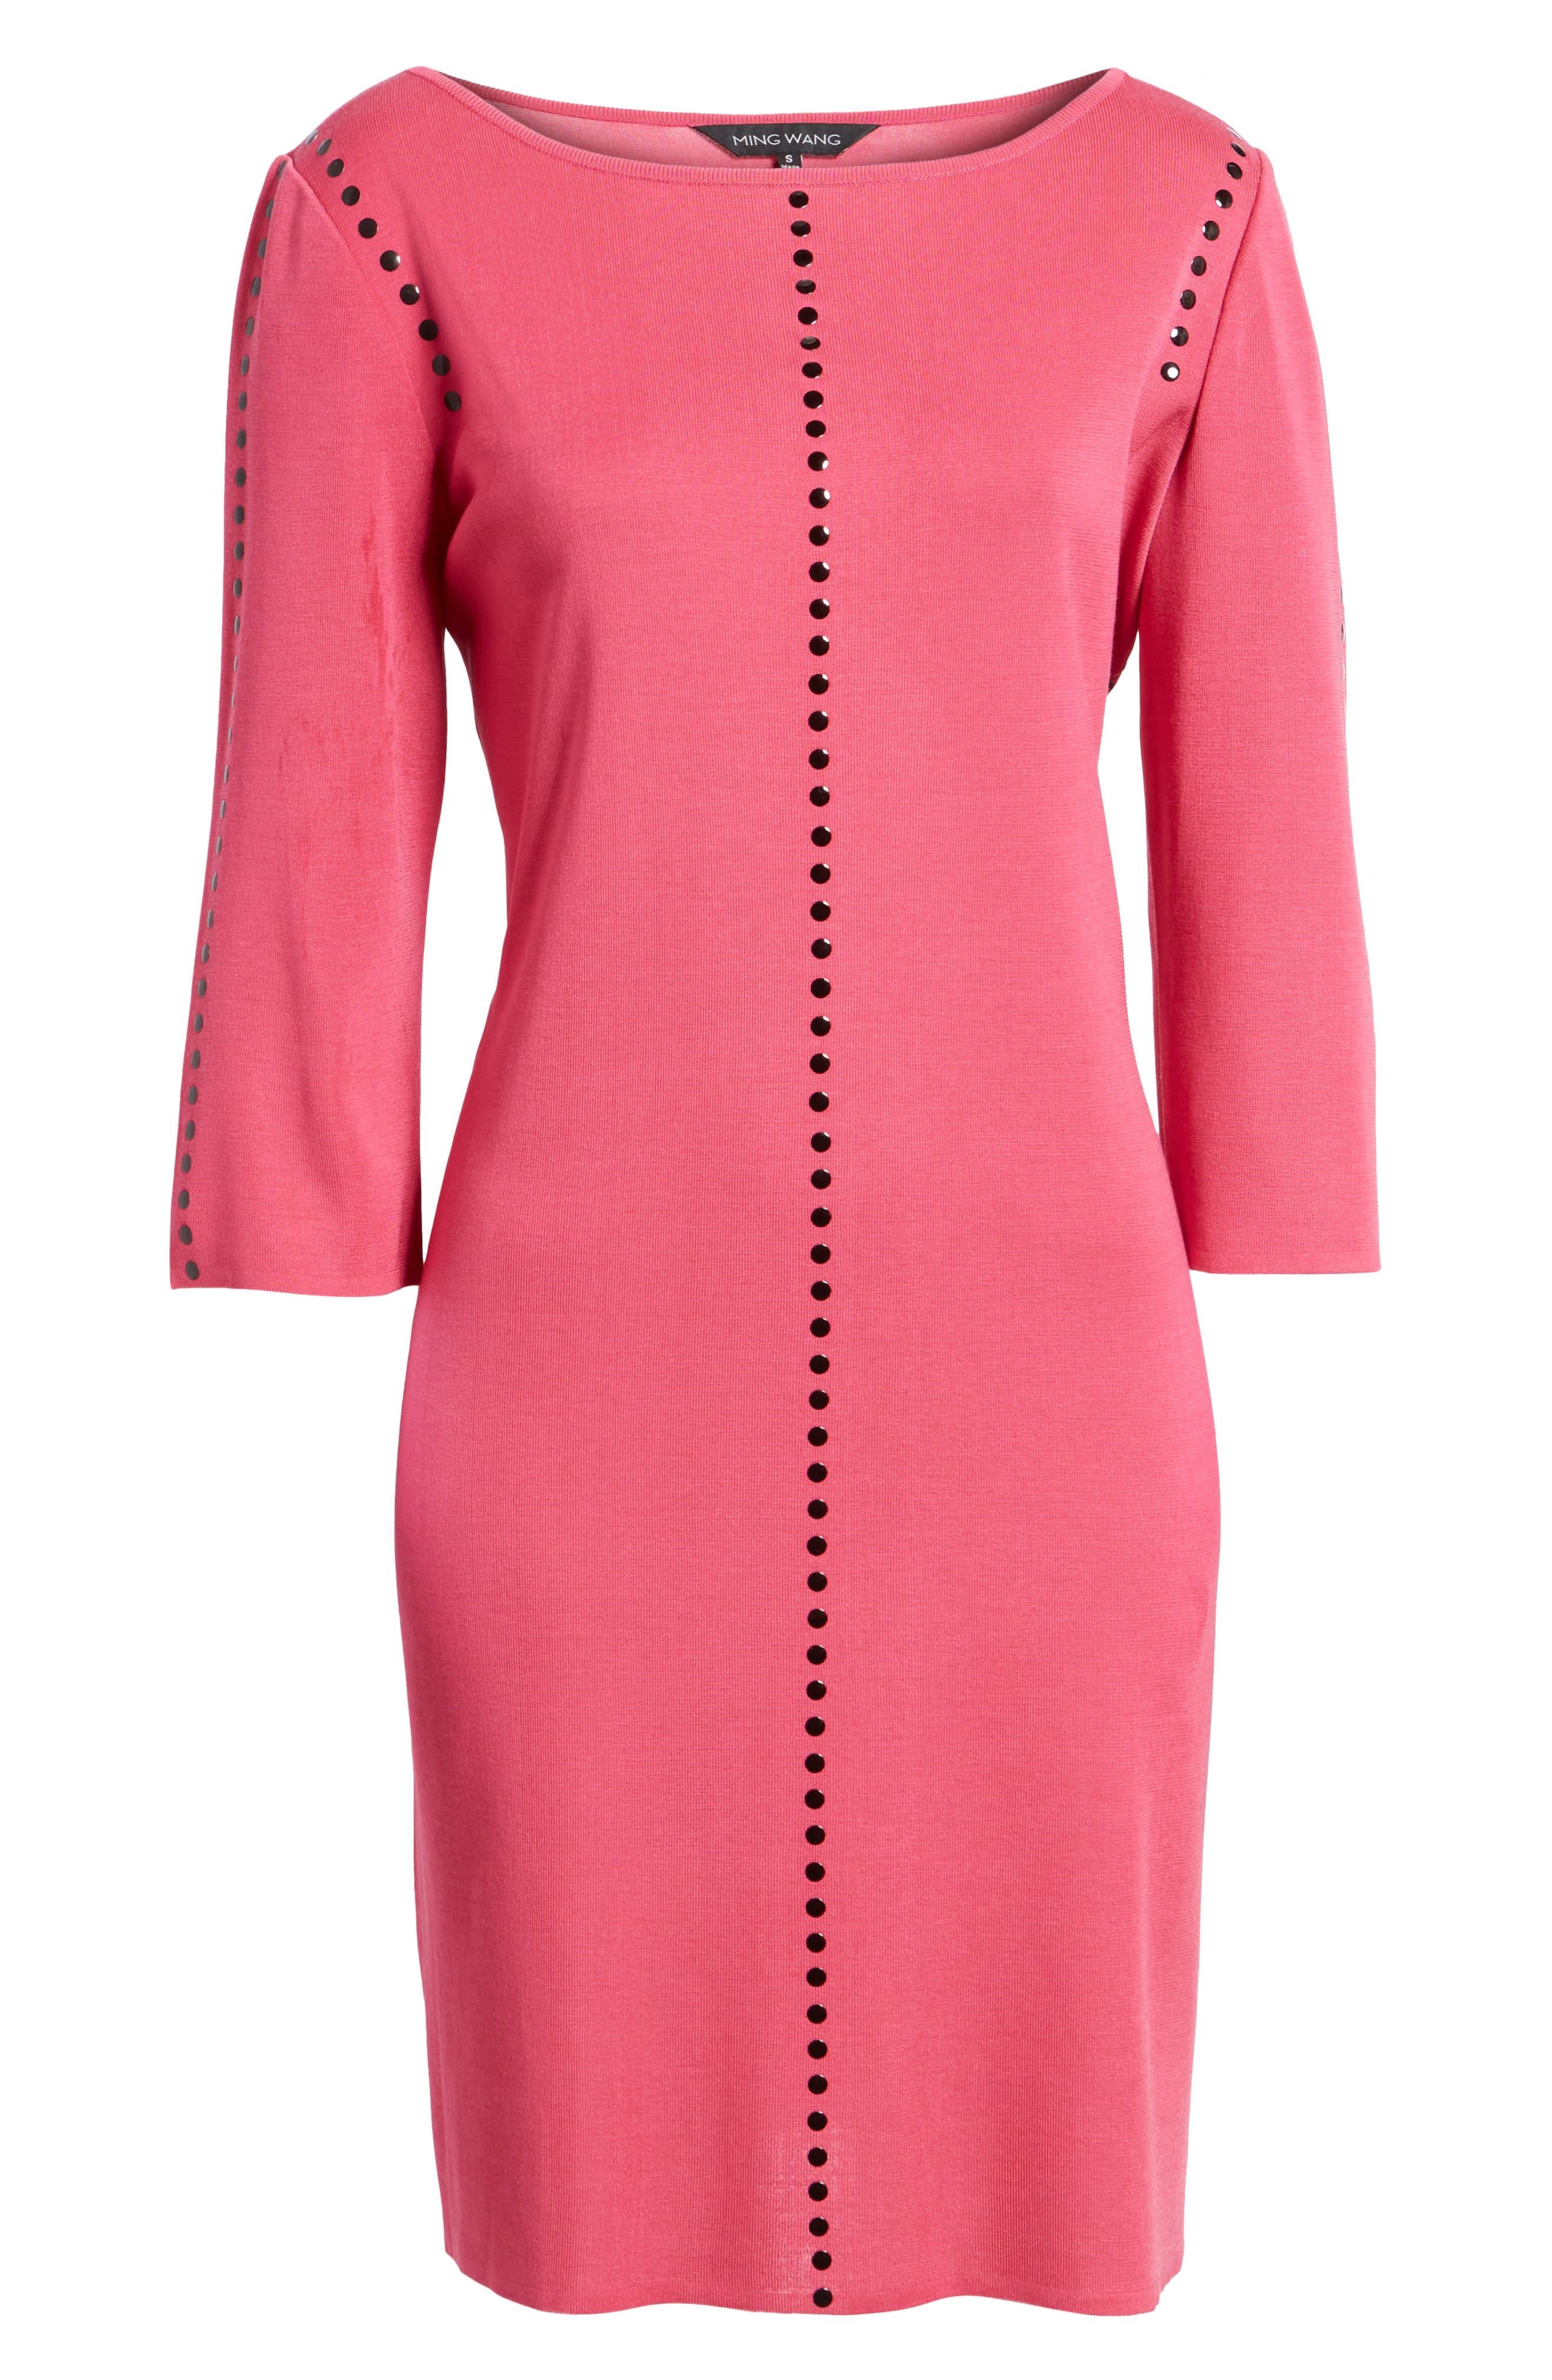 Studded Sweater Dress,                             Alternate thumbnail 6, color,                             643